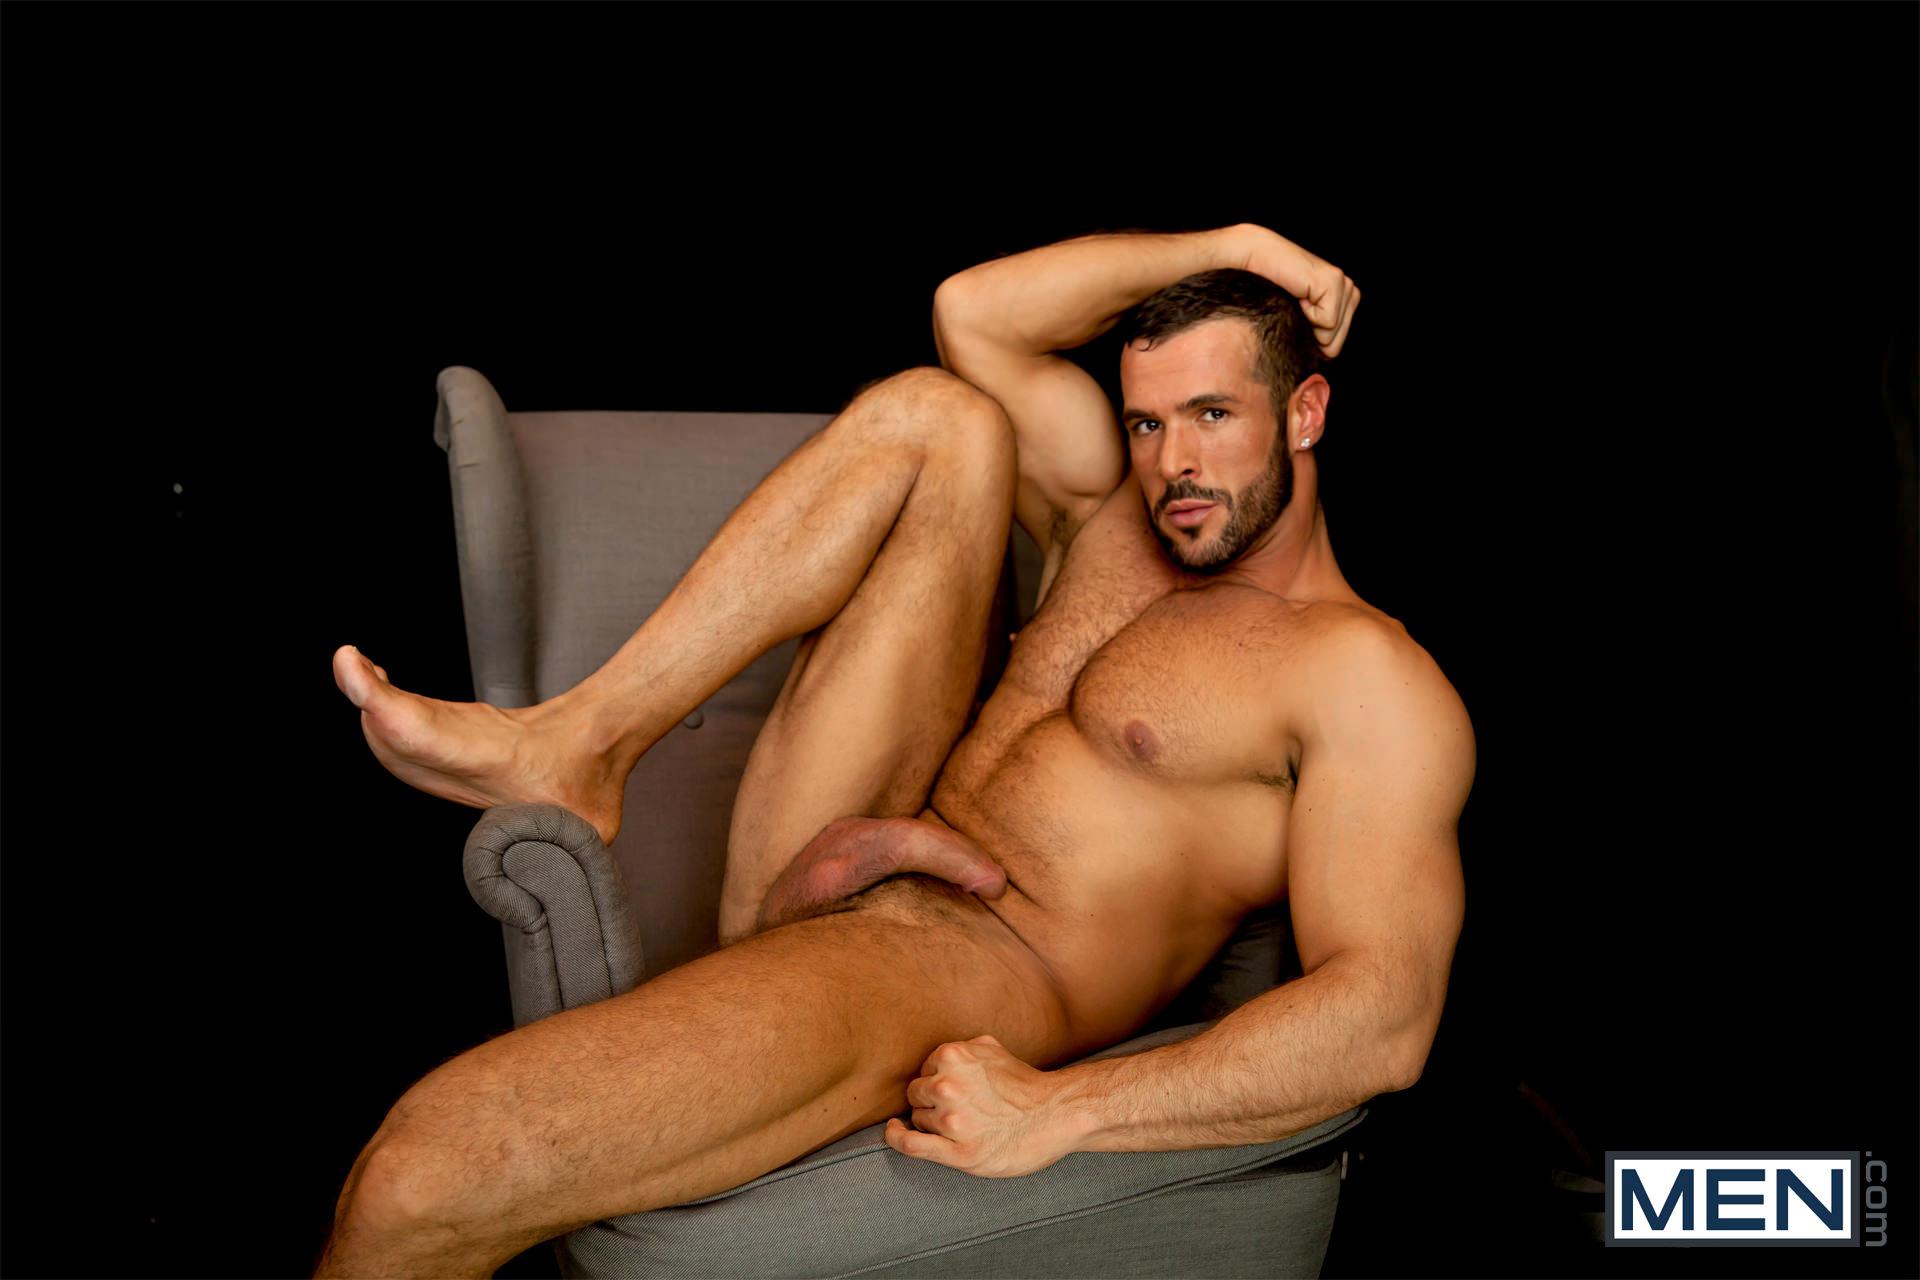 Dennis Vega gay hot daddy dude men porn